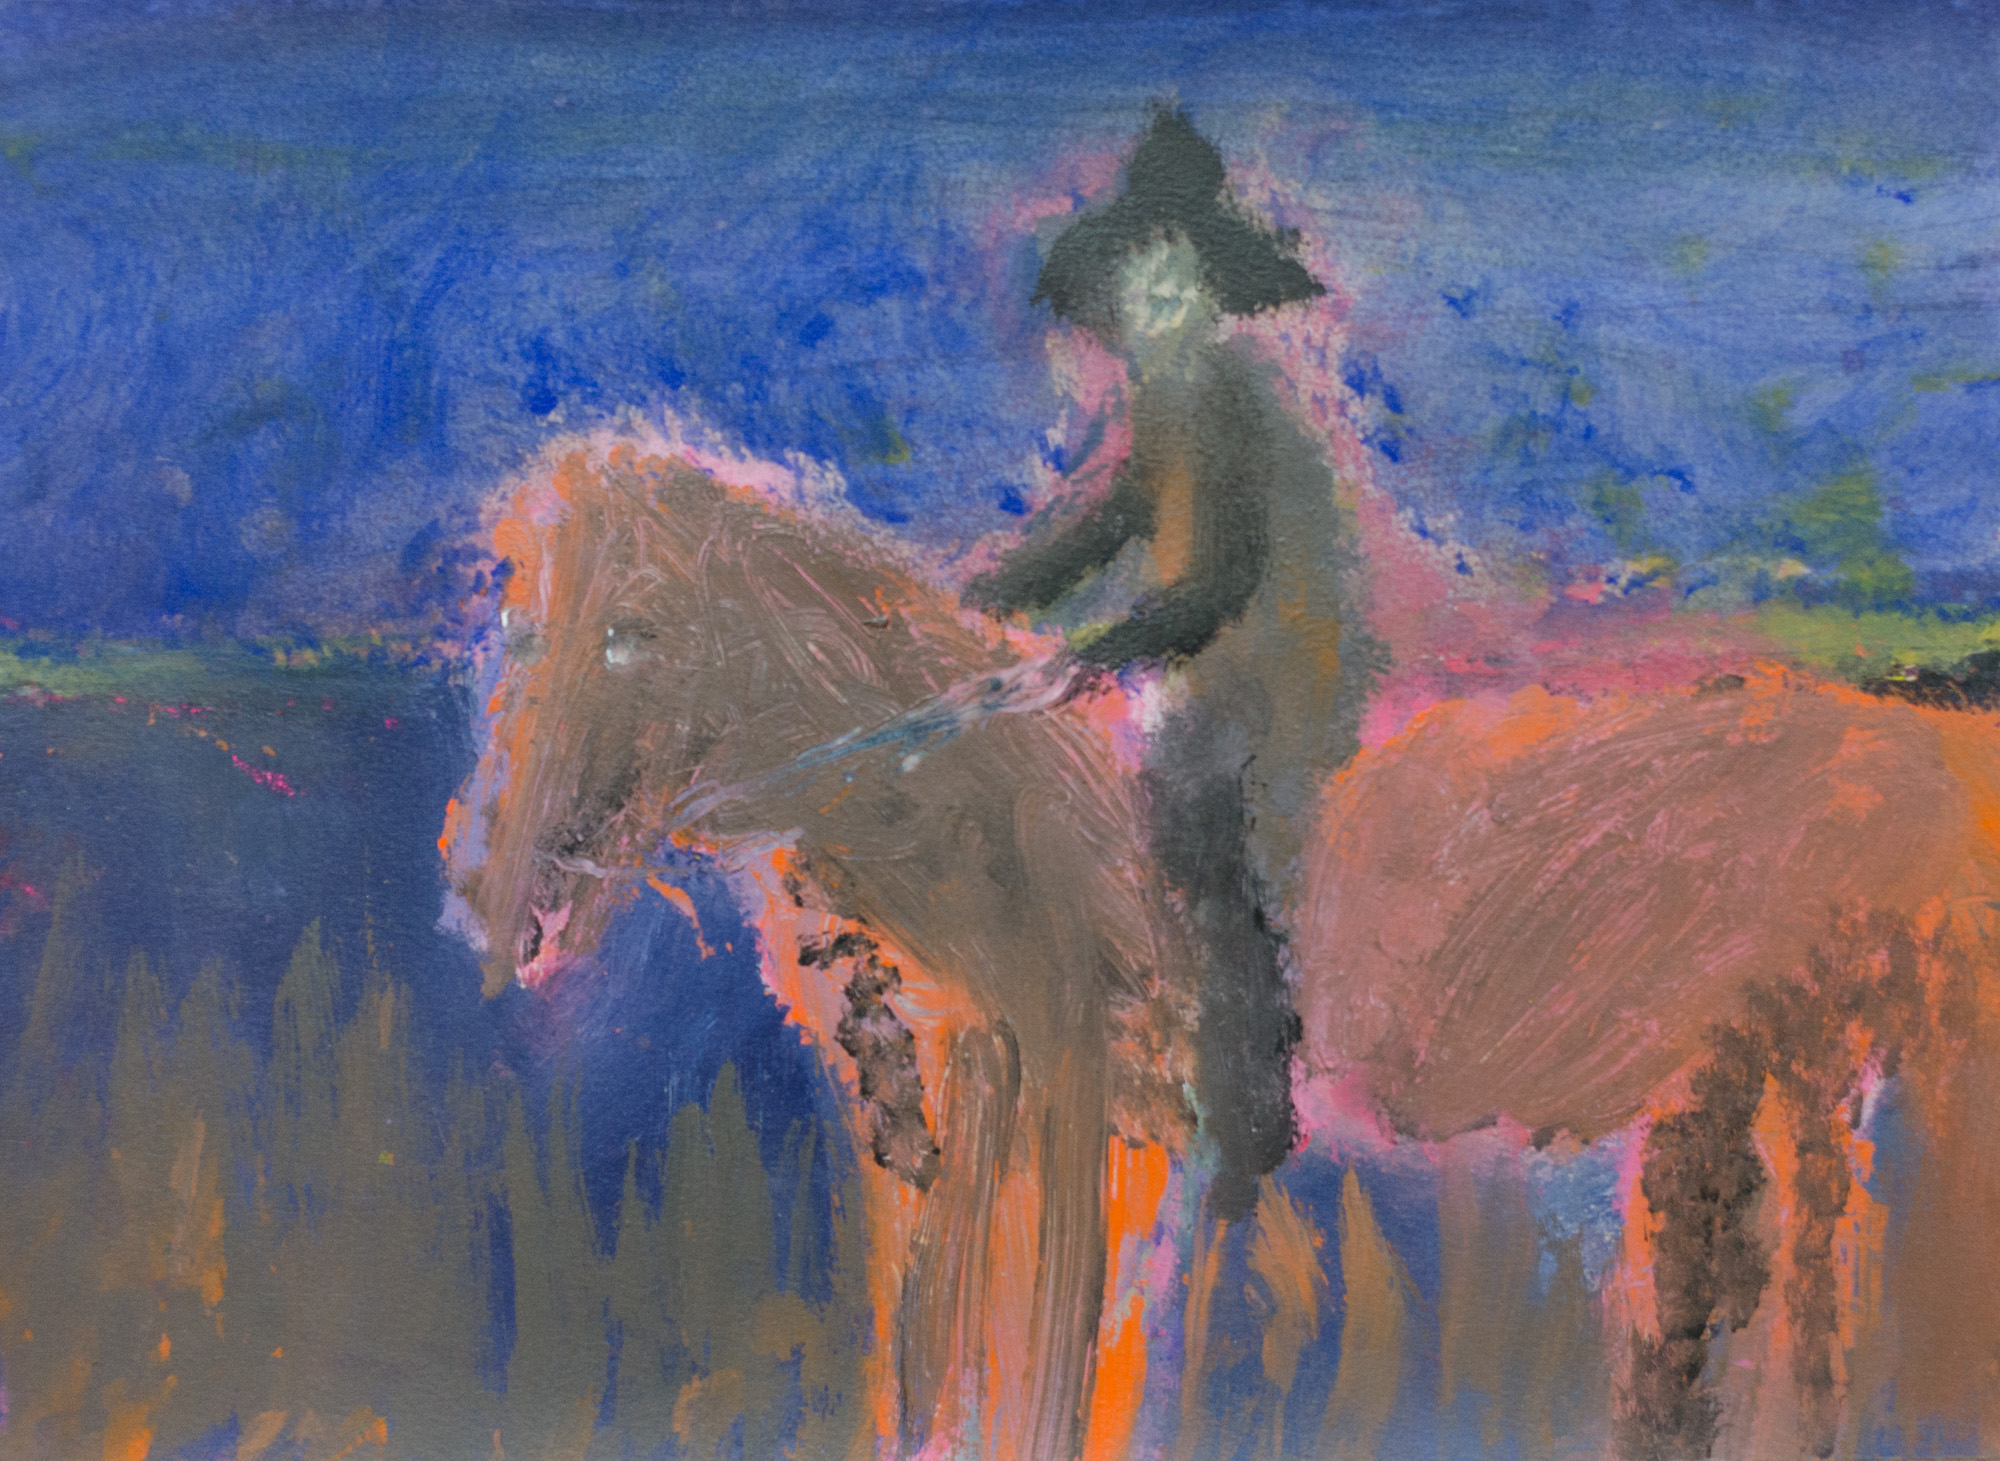 Rhys Lee, Riders, 2016, Acrylic on paper, 28 x 38cm, $700-12.jpg